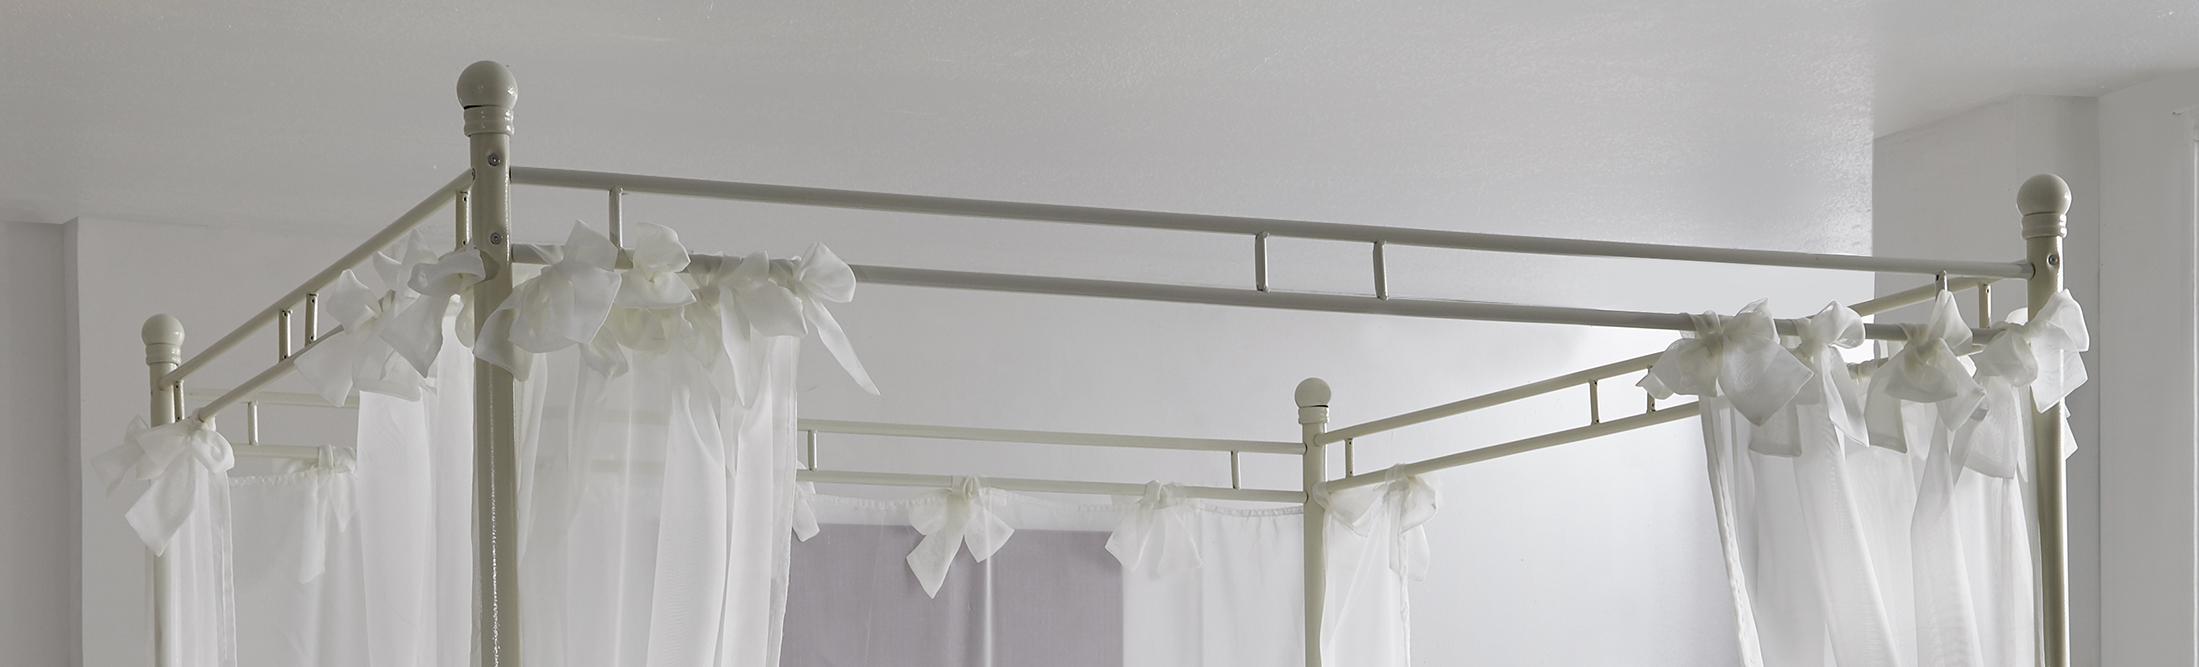 sam design himmelbett 140cm creme wei venezia demn chst. Black Bedroom Furniture Sets. Home Design Ideas